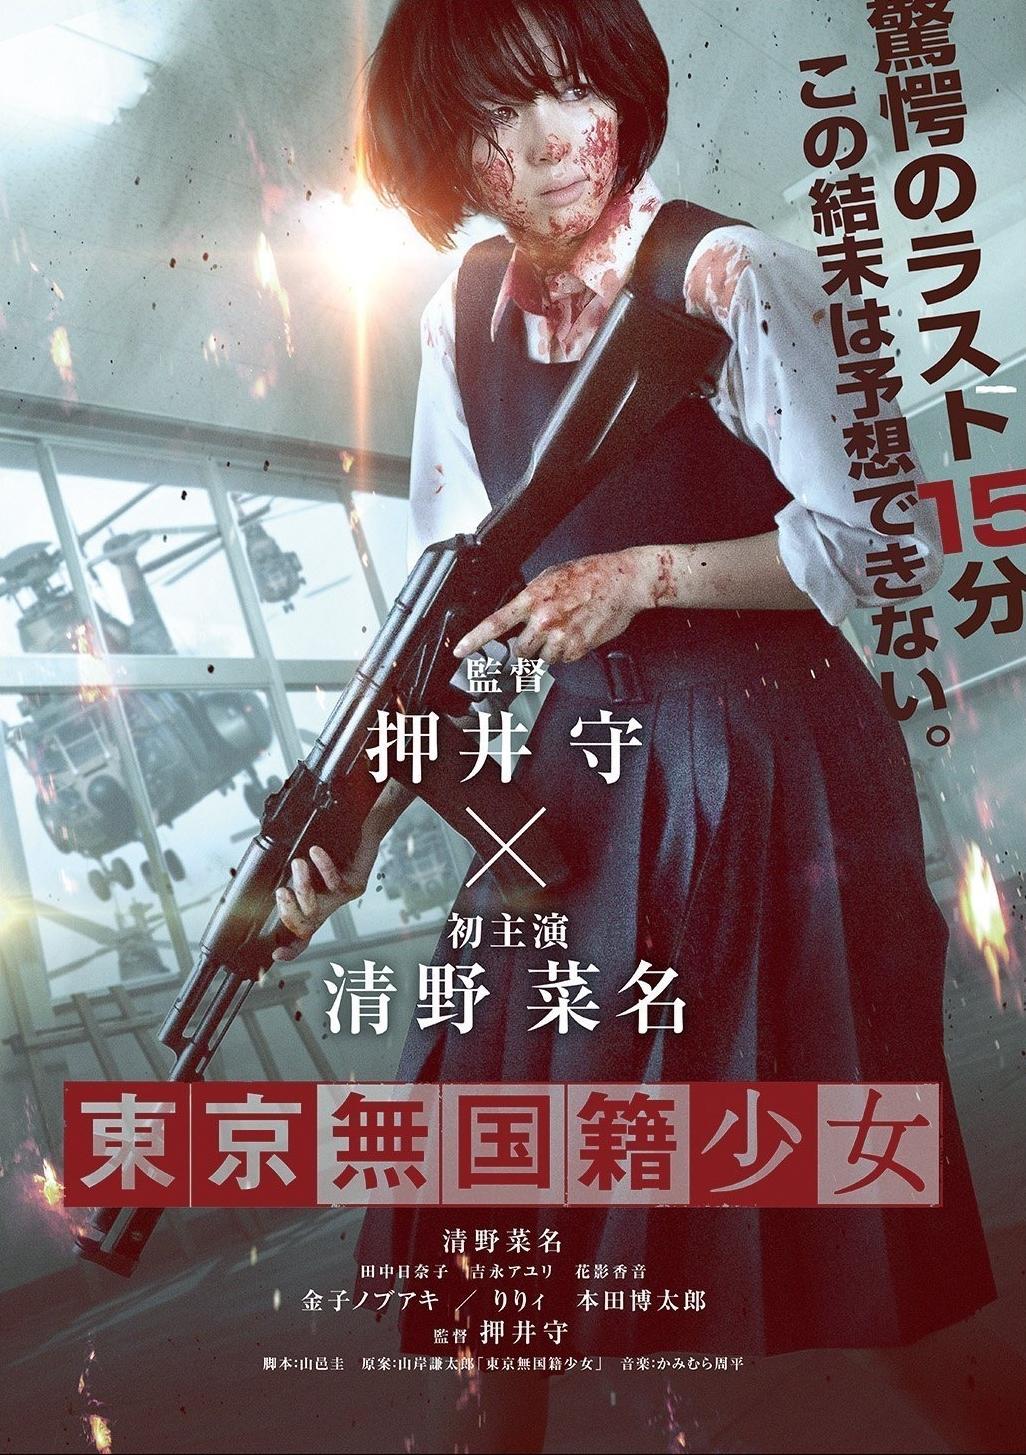 Xem Phim Nữ Sinh Tokyo 2015